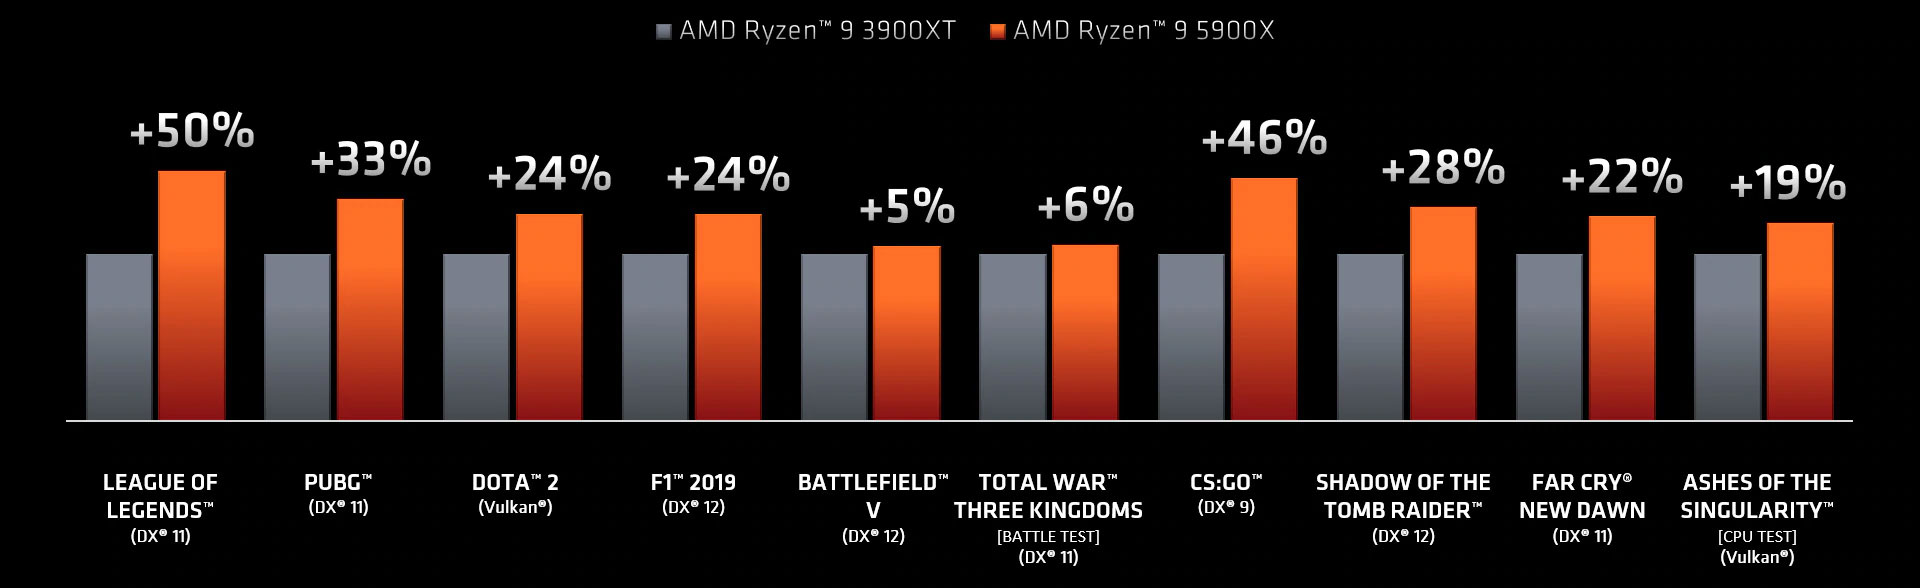 AMD Ryzen Desktop Processors